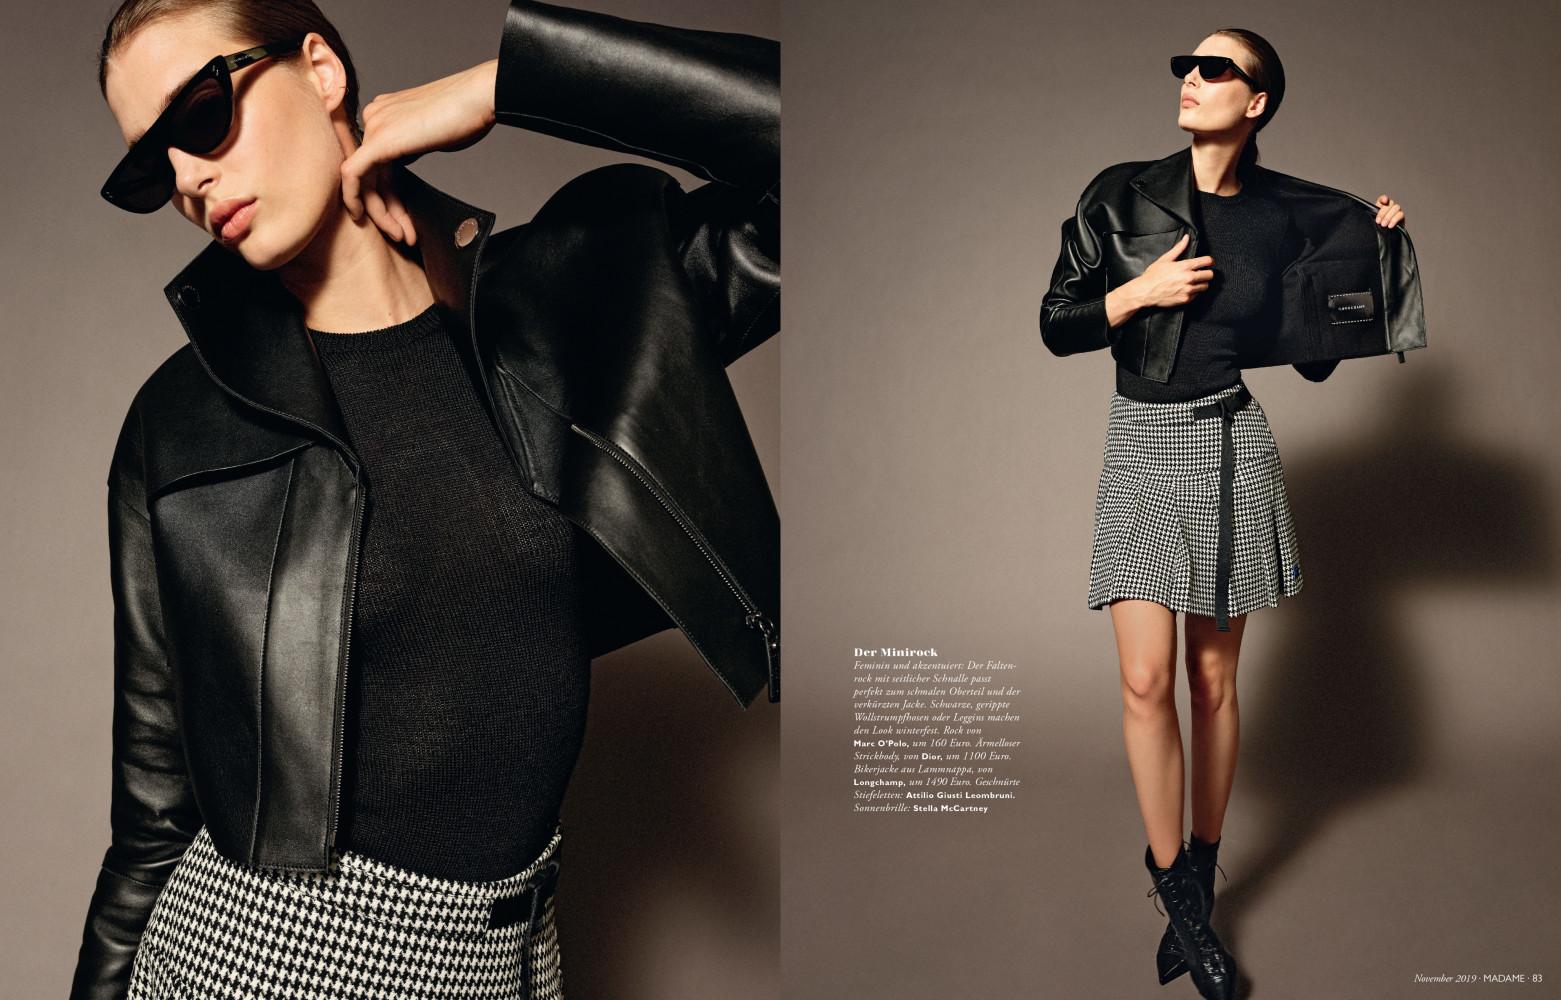 Claire For Madame Magazine